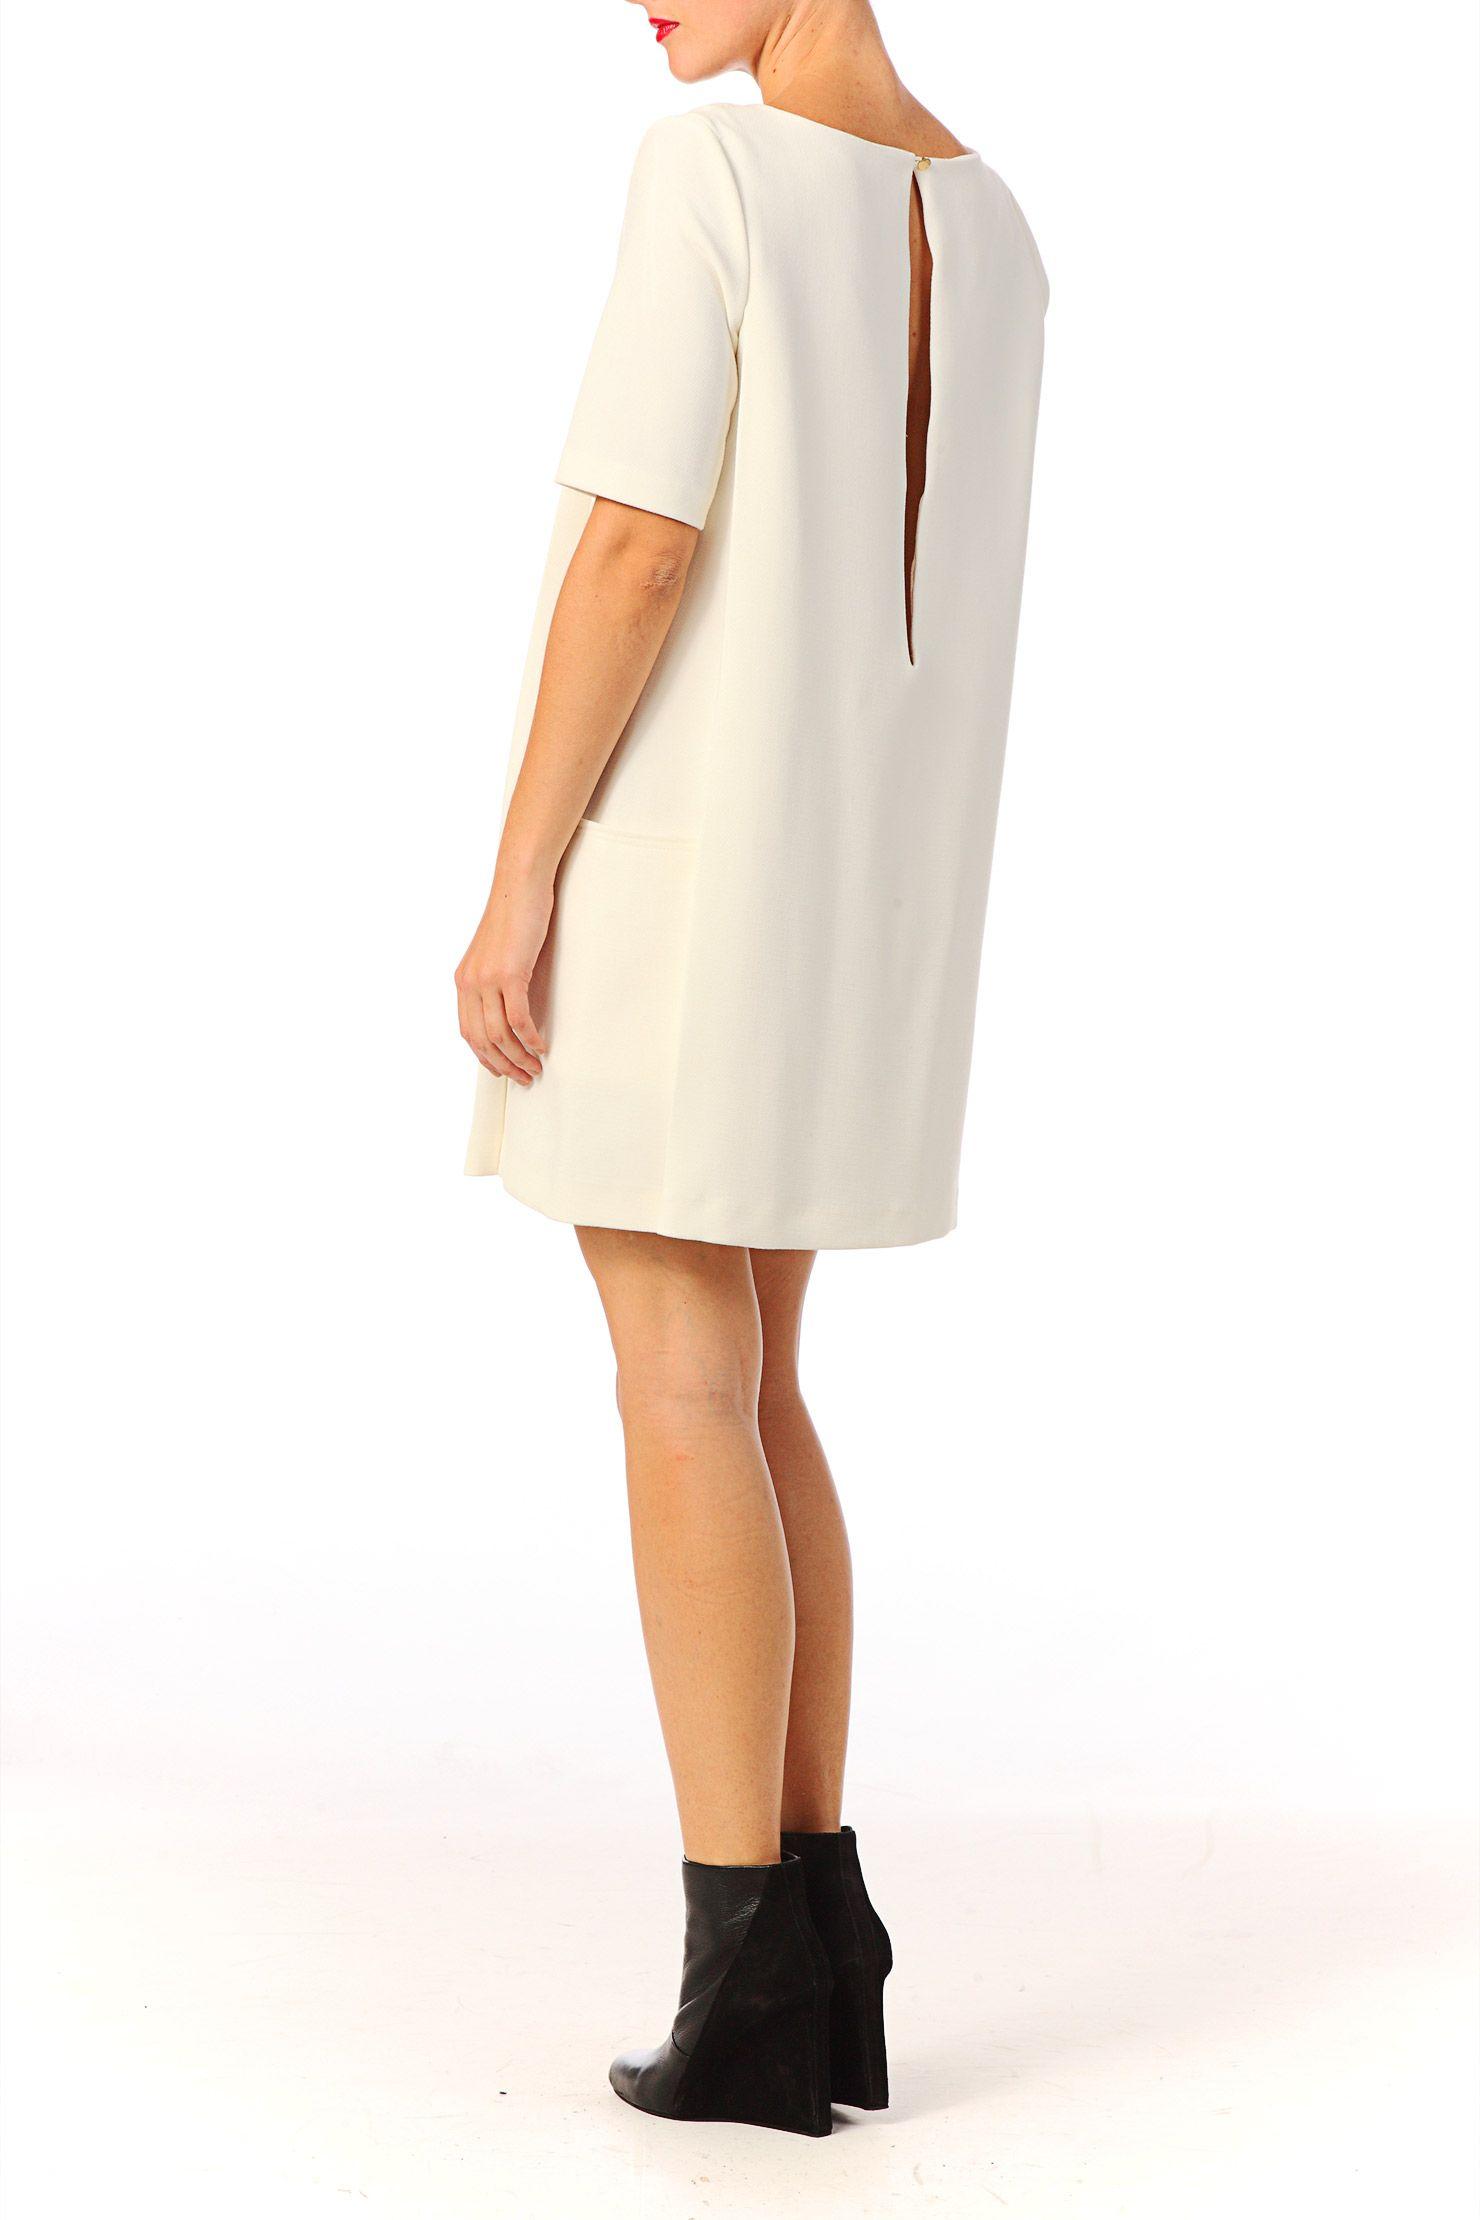 77d3e0d07ca Robe droite Noctambule Blanc   Ecru Ba sh sur MonShowroom.com